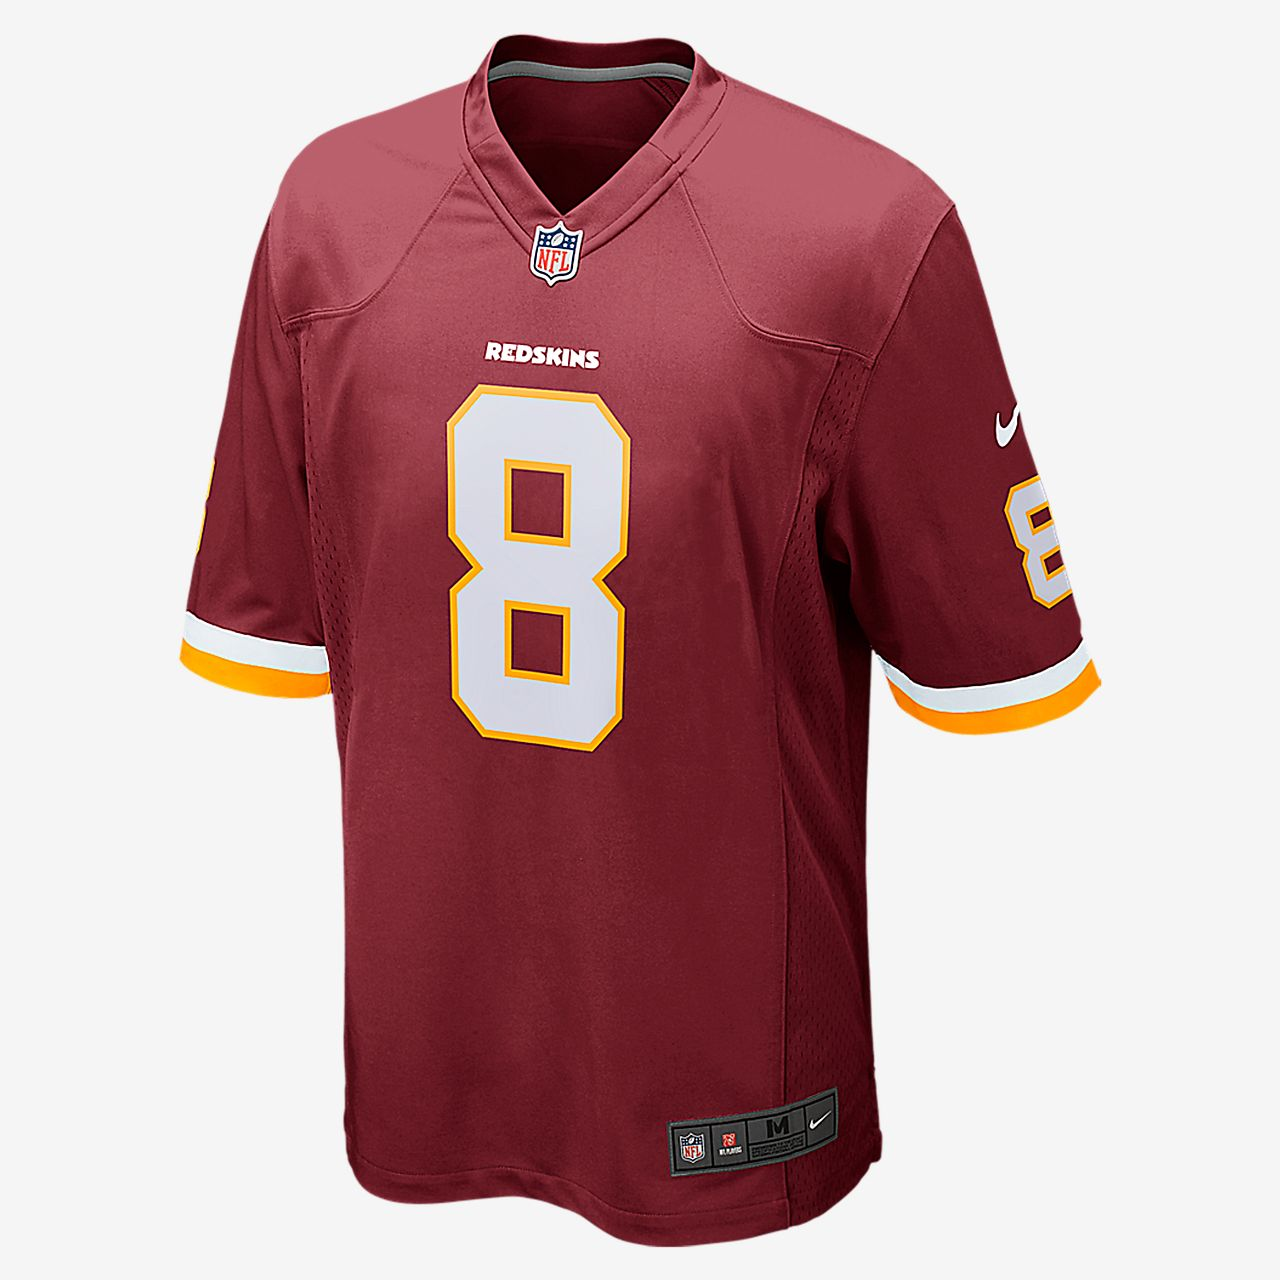 NFL Washington Redskins (Kirk Cousins) Men s American Football Home ... 370560ec1